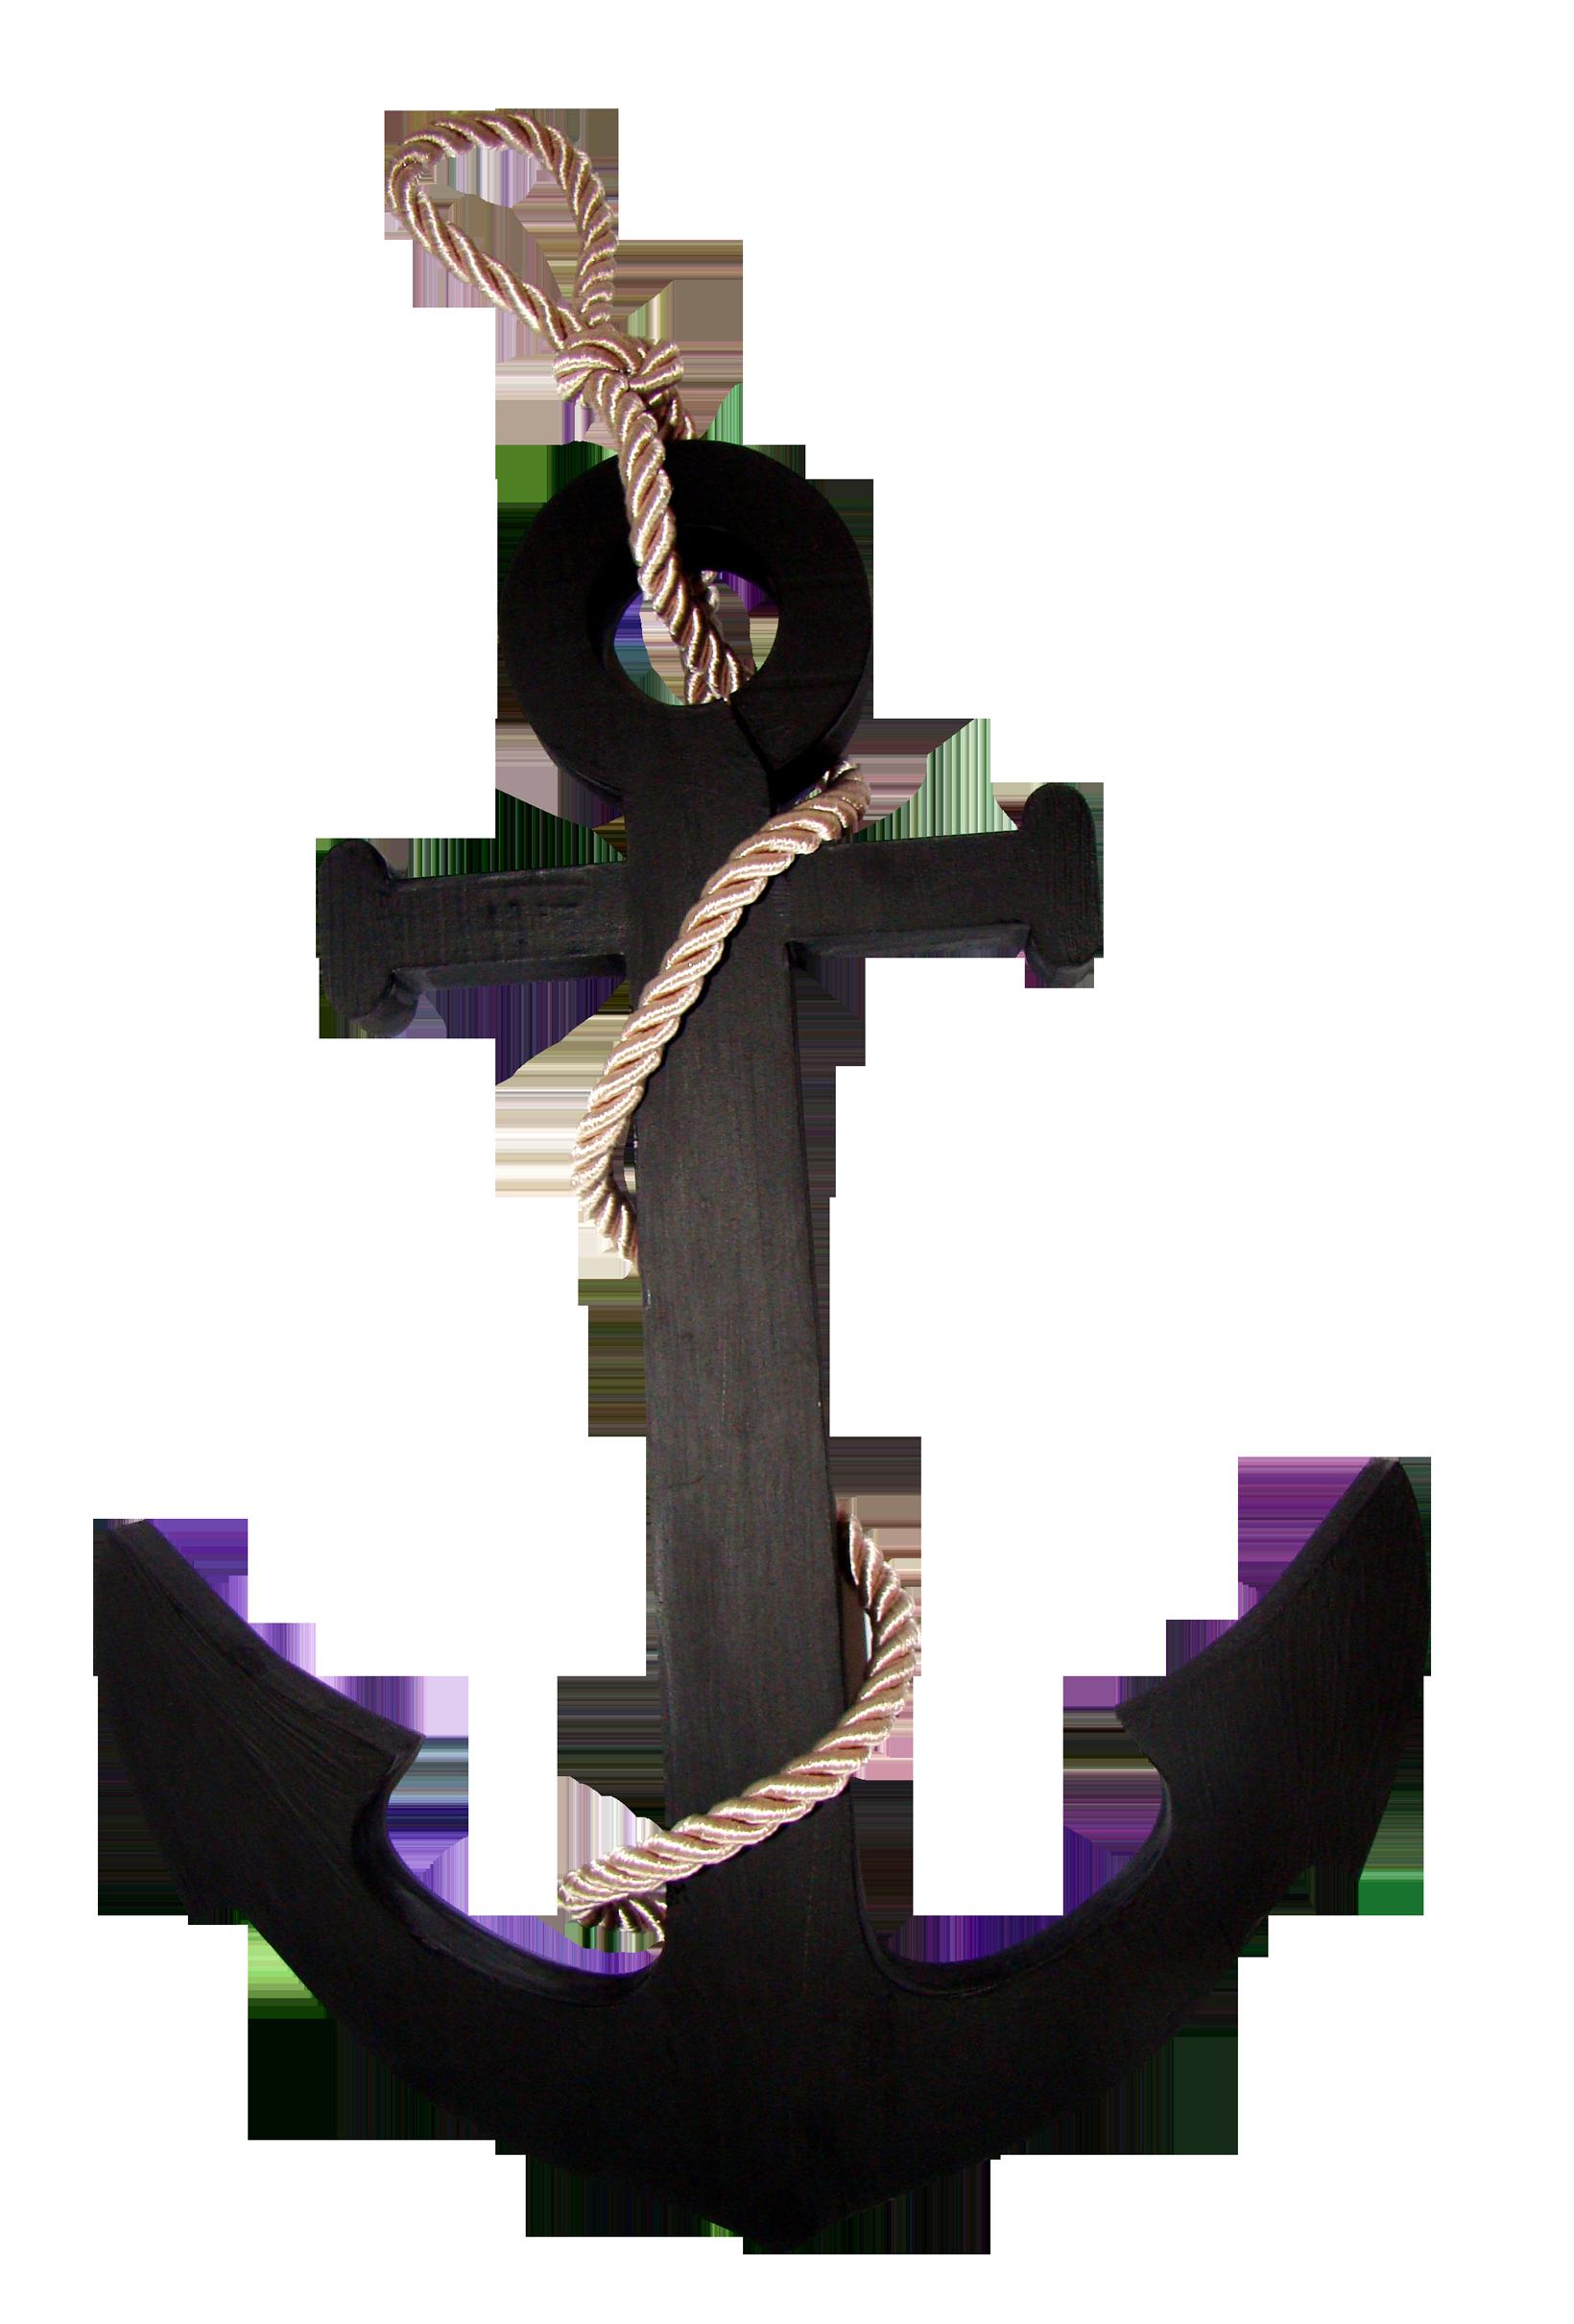 Png transparent image pngpix. Clipart anchor sea anchor